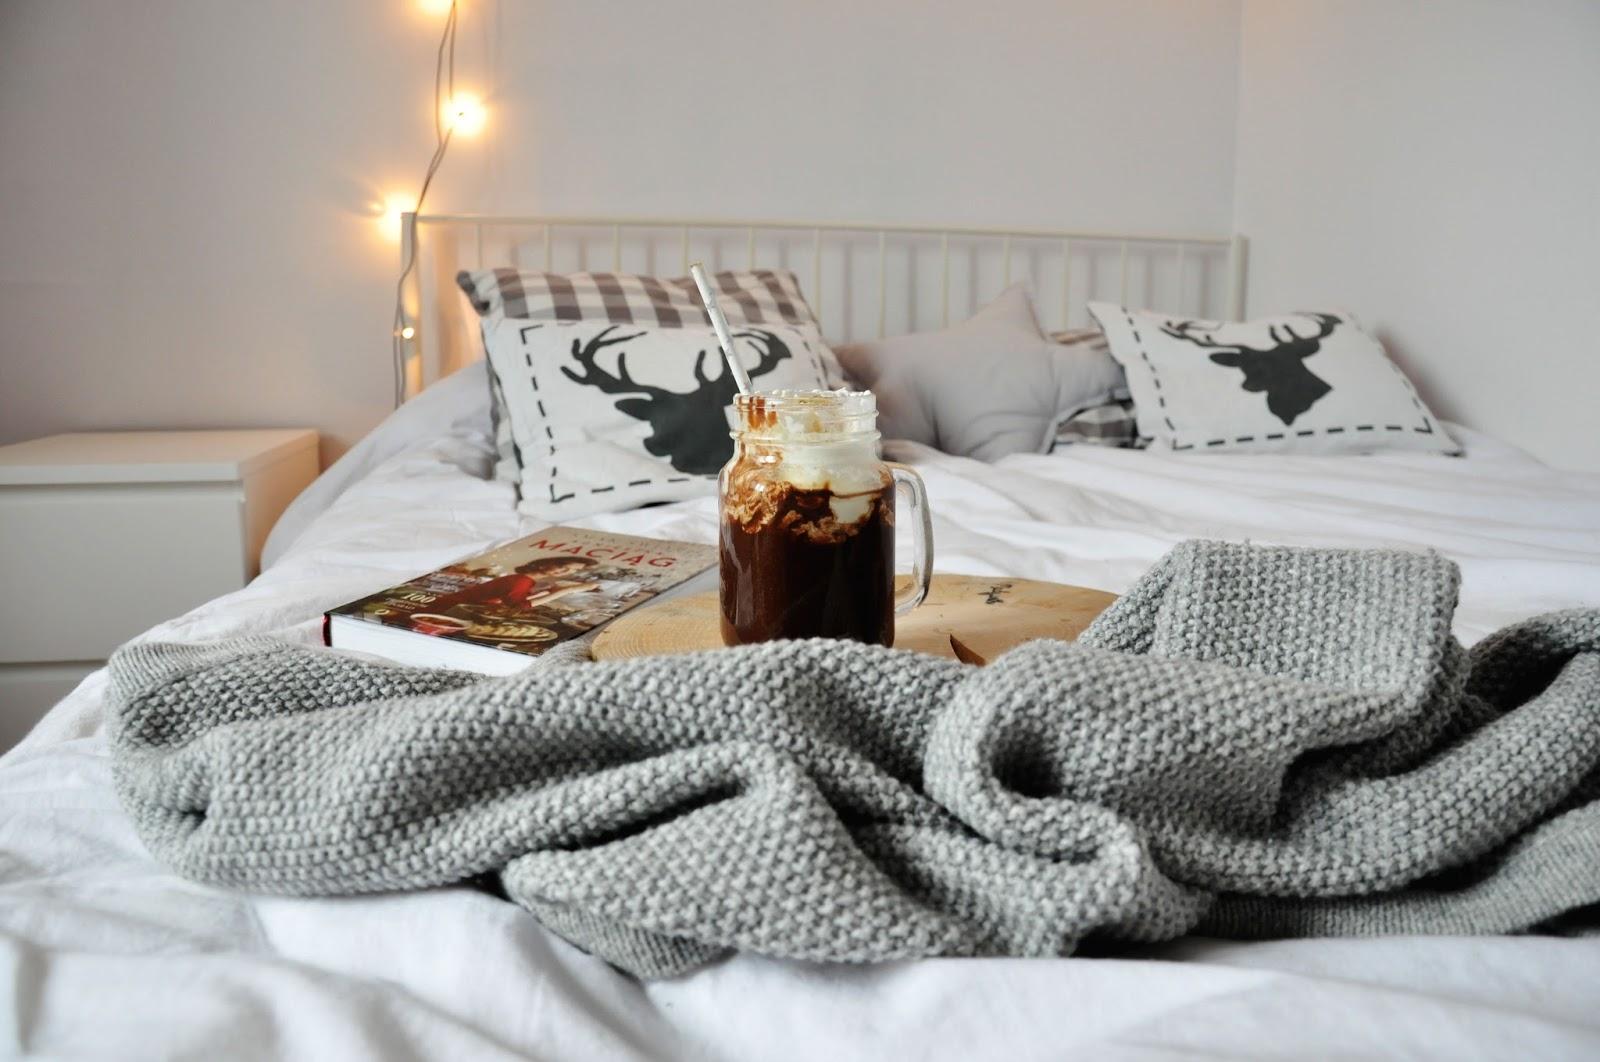 łóżko ikea leirvik, koc h&m home, gorąca czekolada, smak świąt agnieszka maciąg